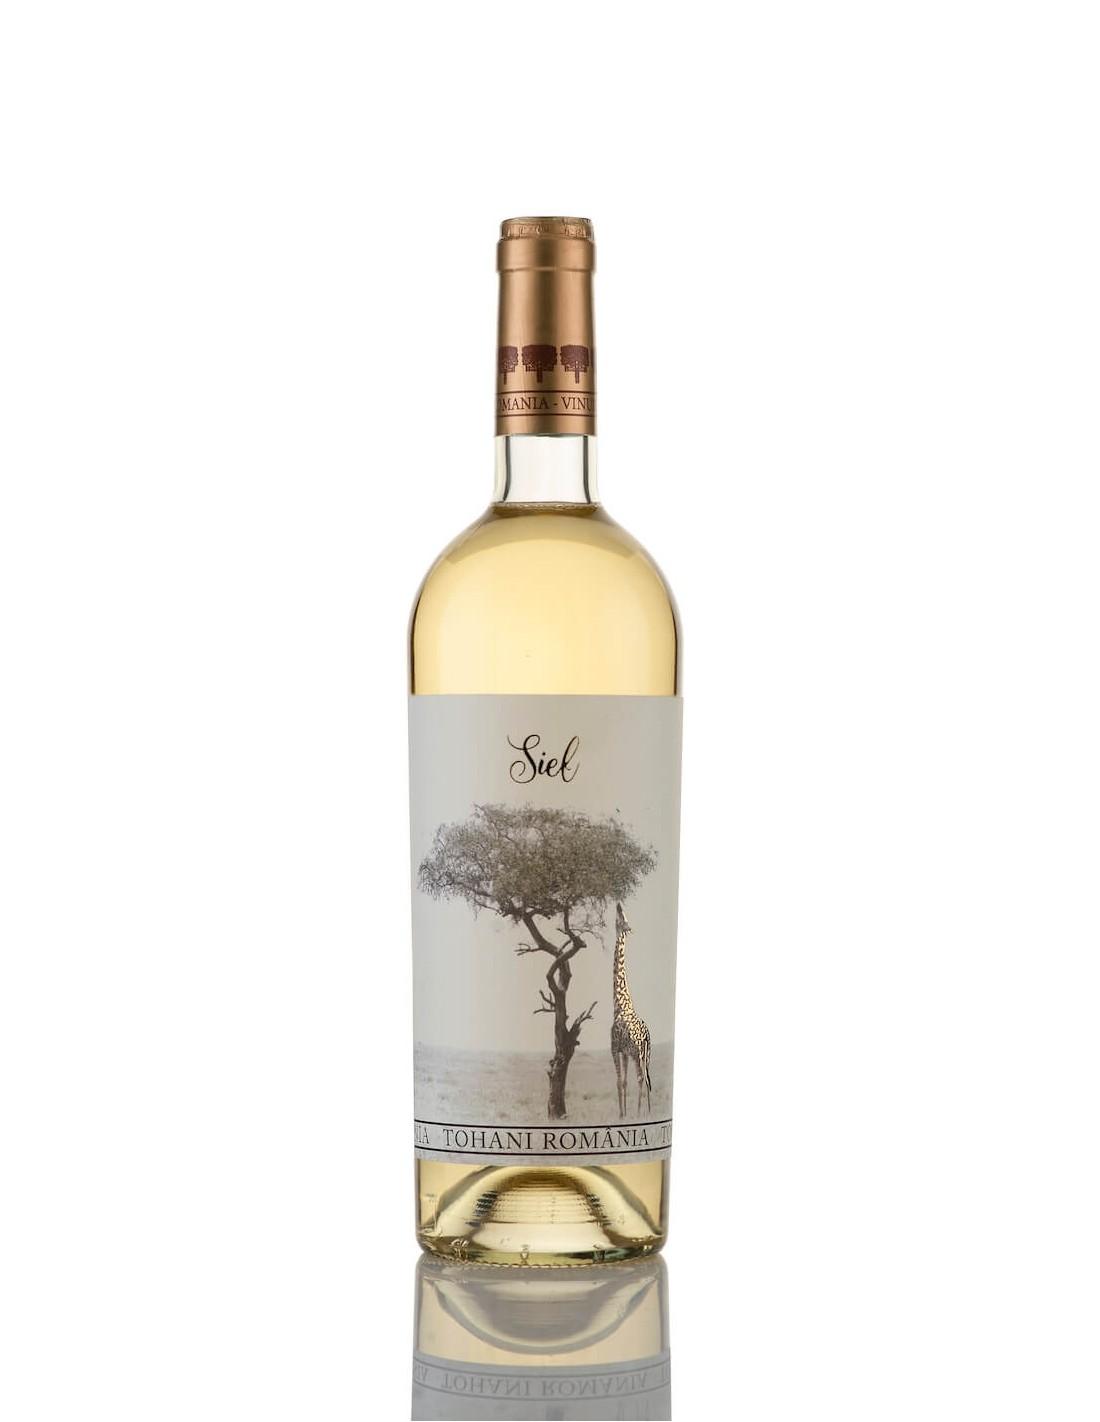 Vin alb sec, Cupaj, Siel Dealu Mare, 0.75L, 12.5% alc., Romania